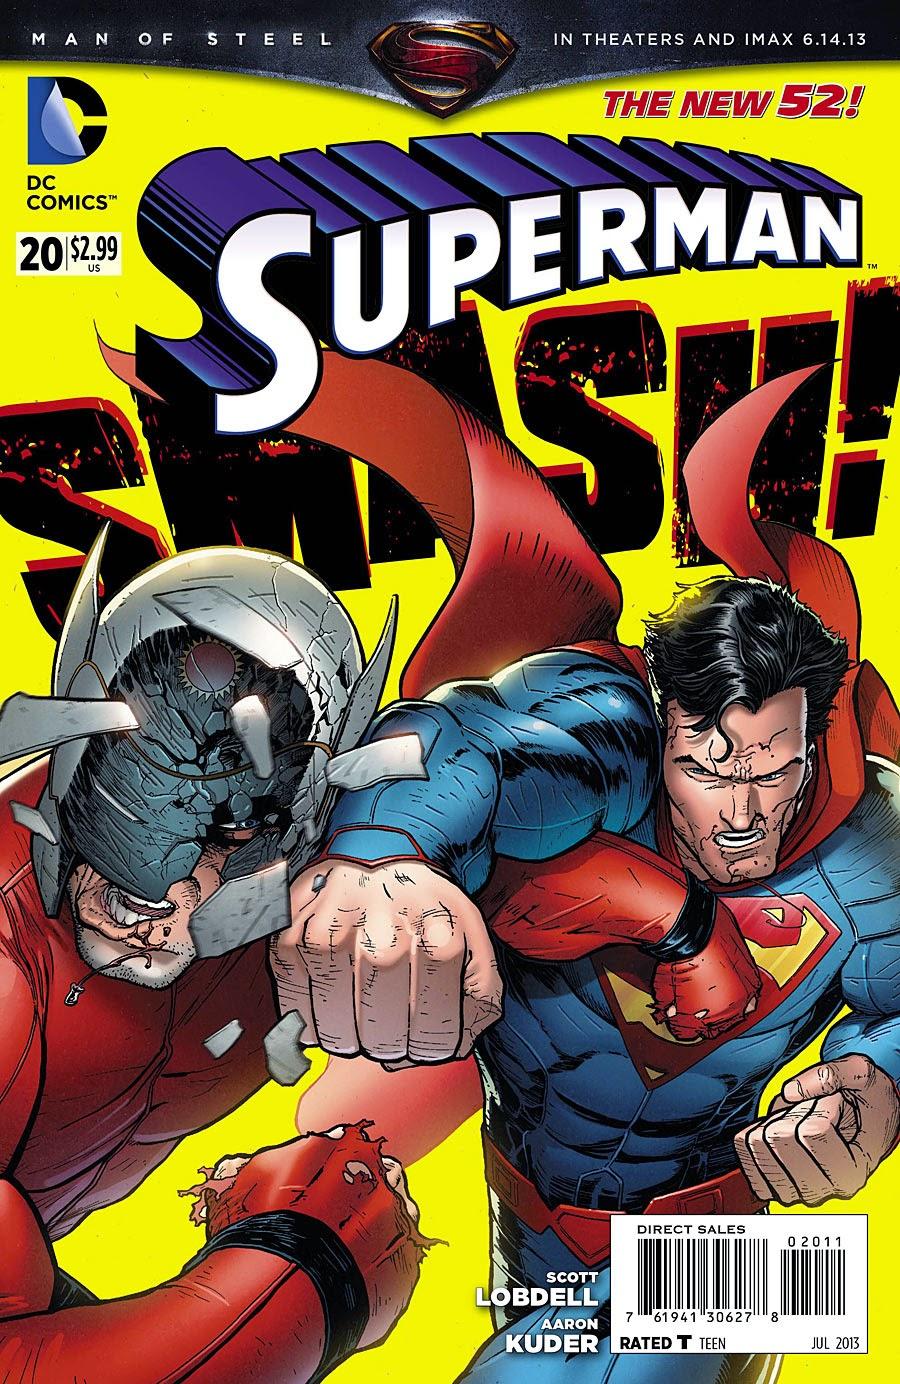 Superman Comic Book White Cover ~ The gallifreyan gazette greg pak and aaron kuder new